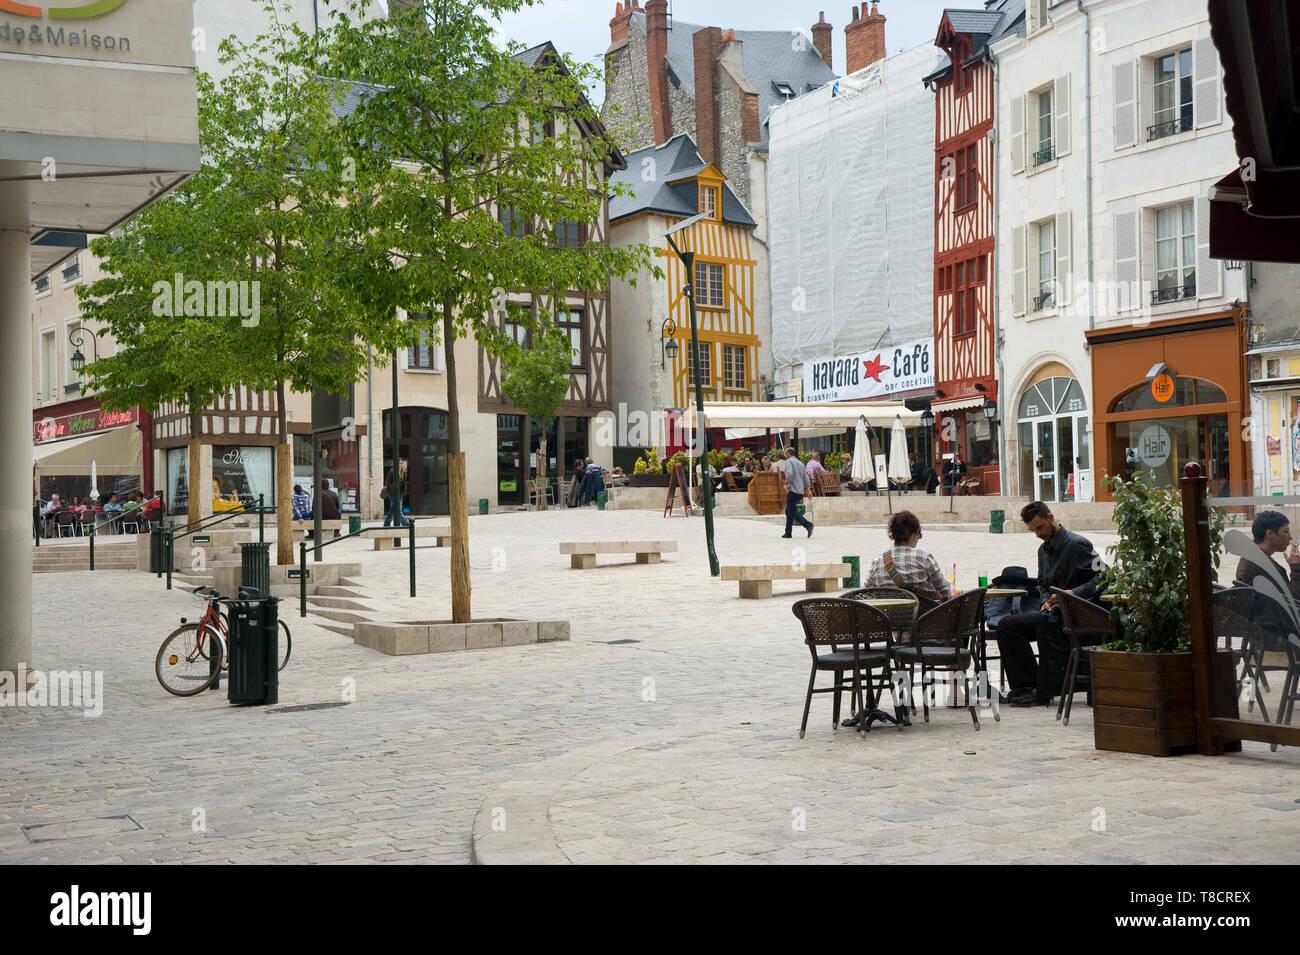 Maison Du Convertible Sebastopol chatelet square stock photos & chatelet square stock images